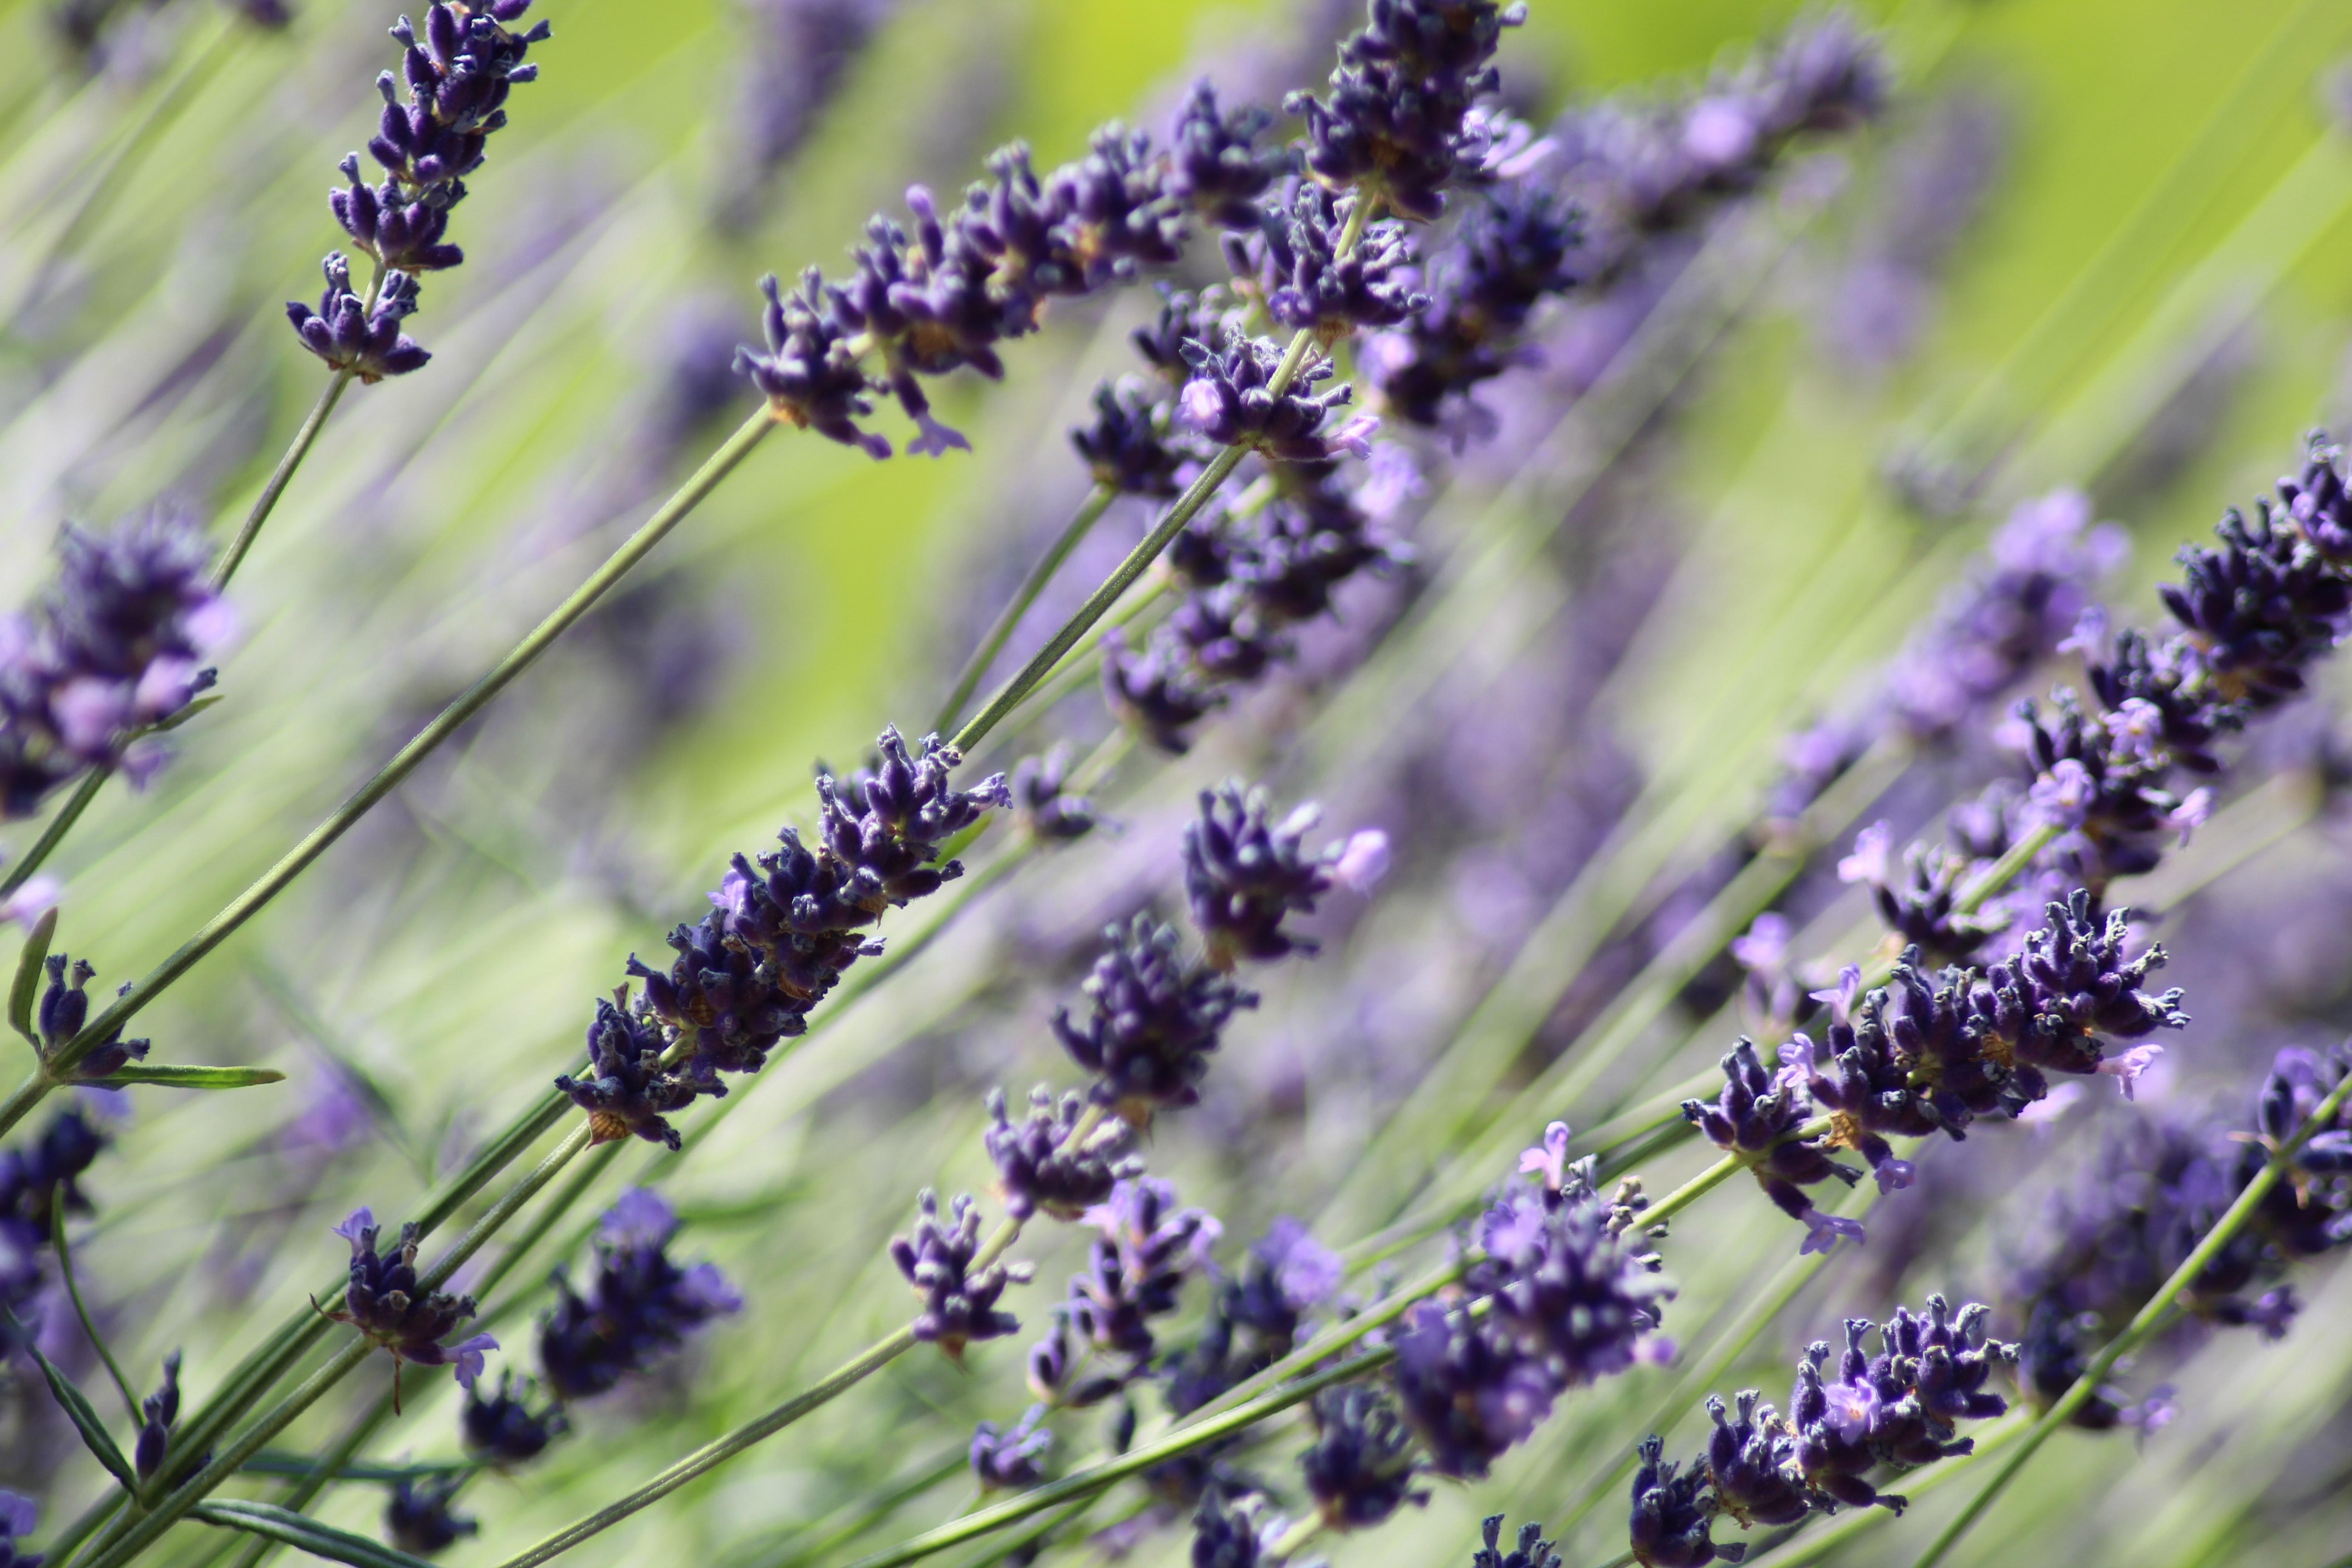 Personal Plants Recipes: 3-Ingredient Lavender Lemonade!